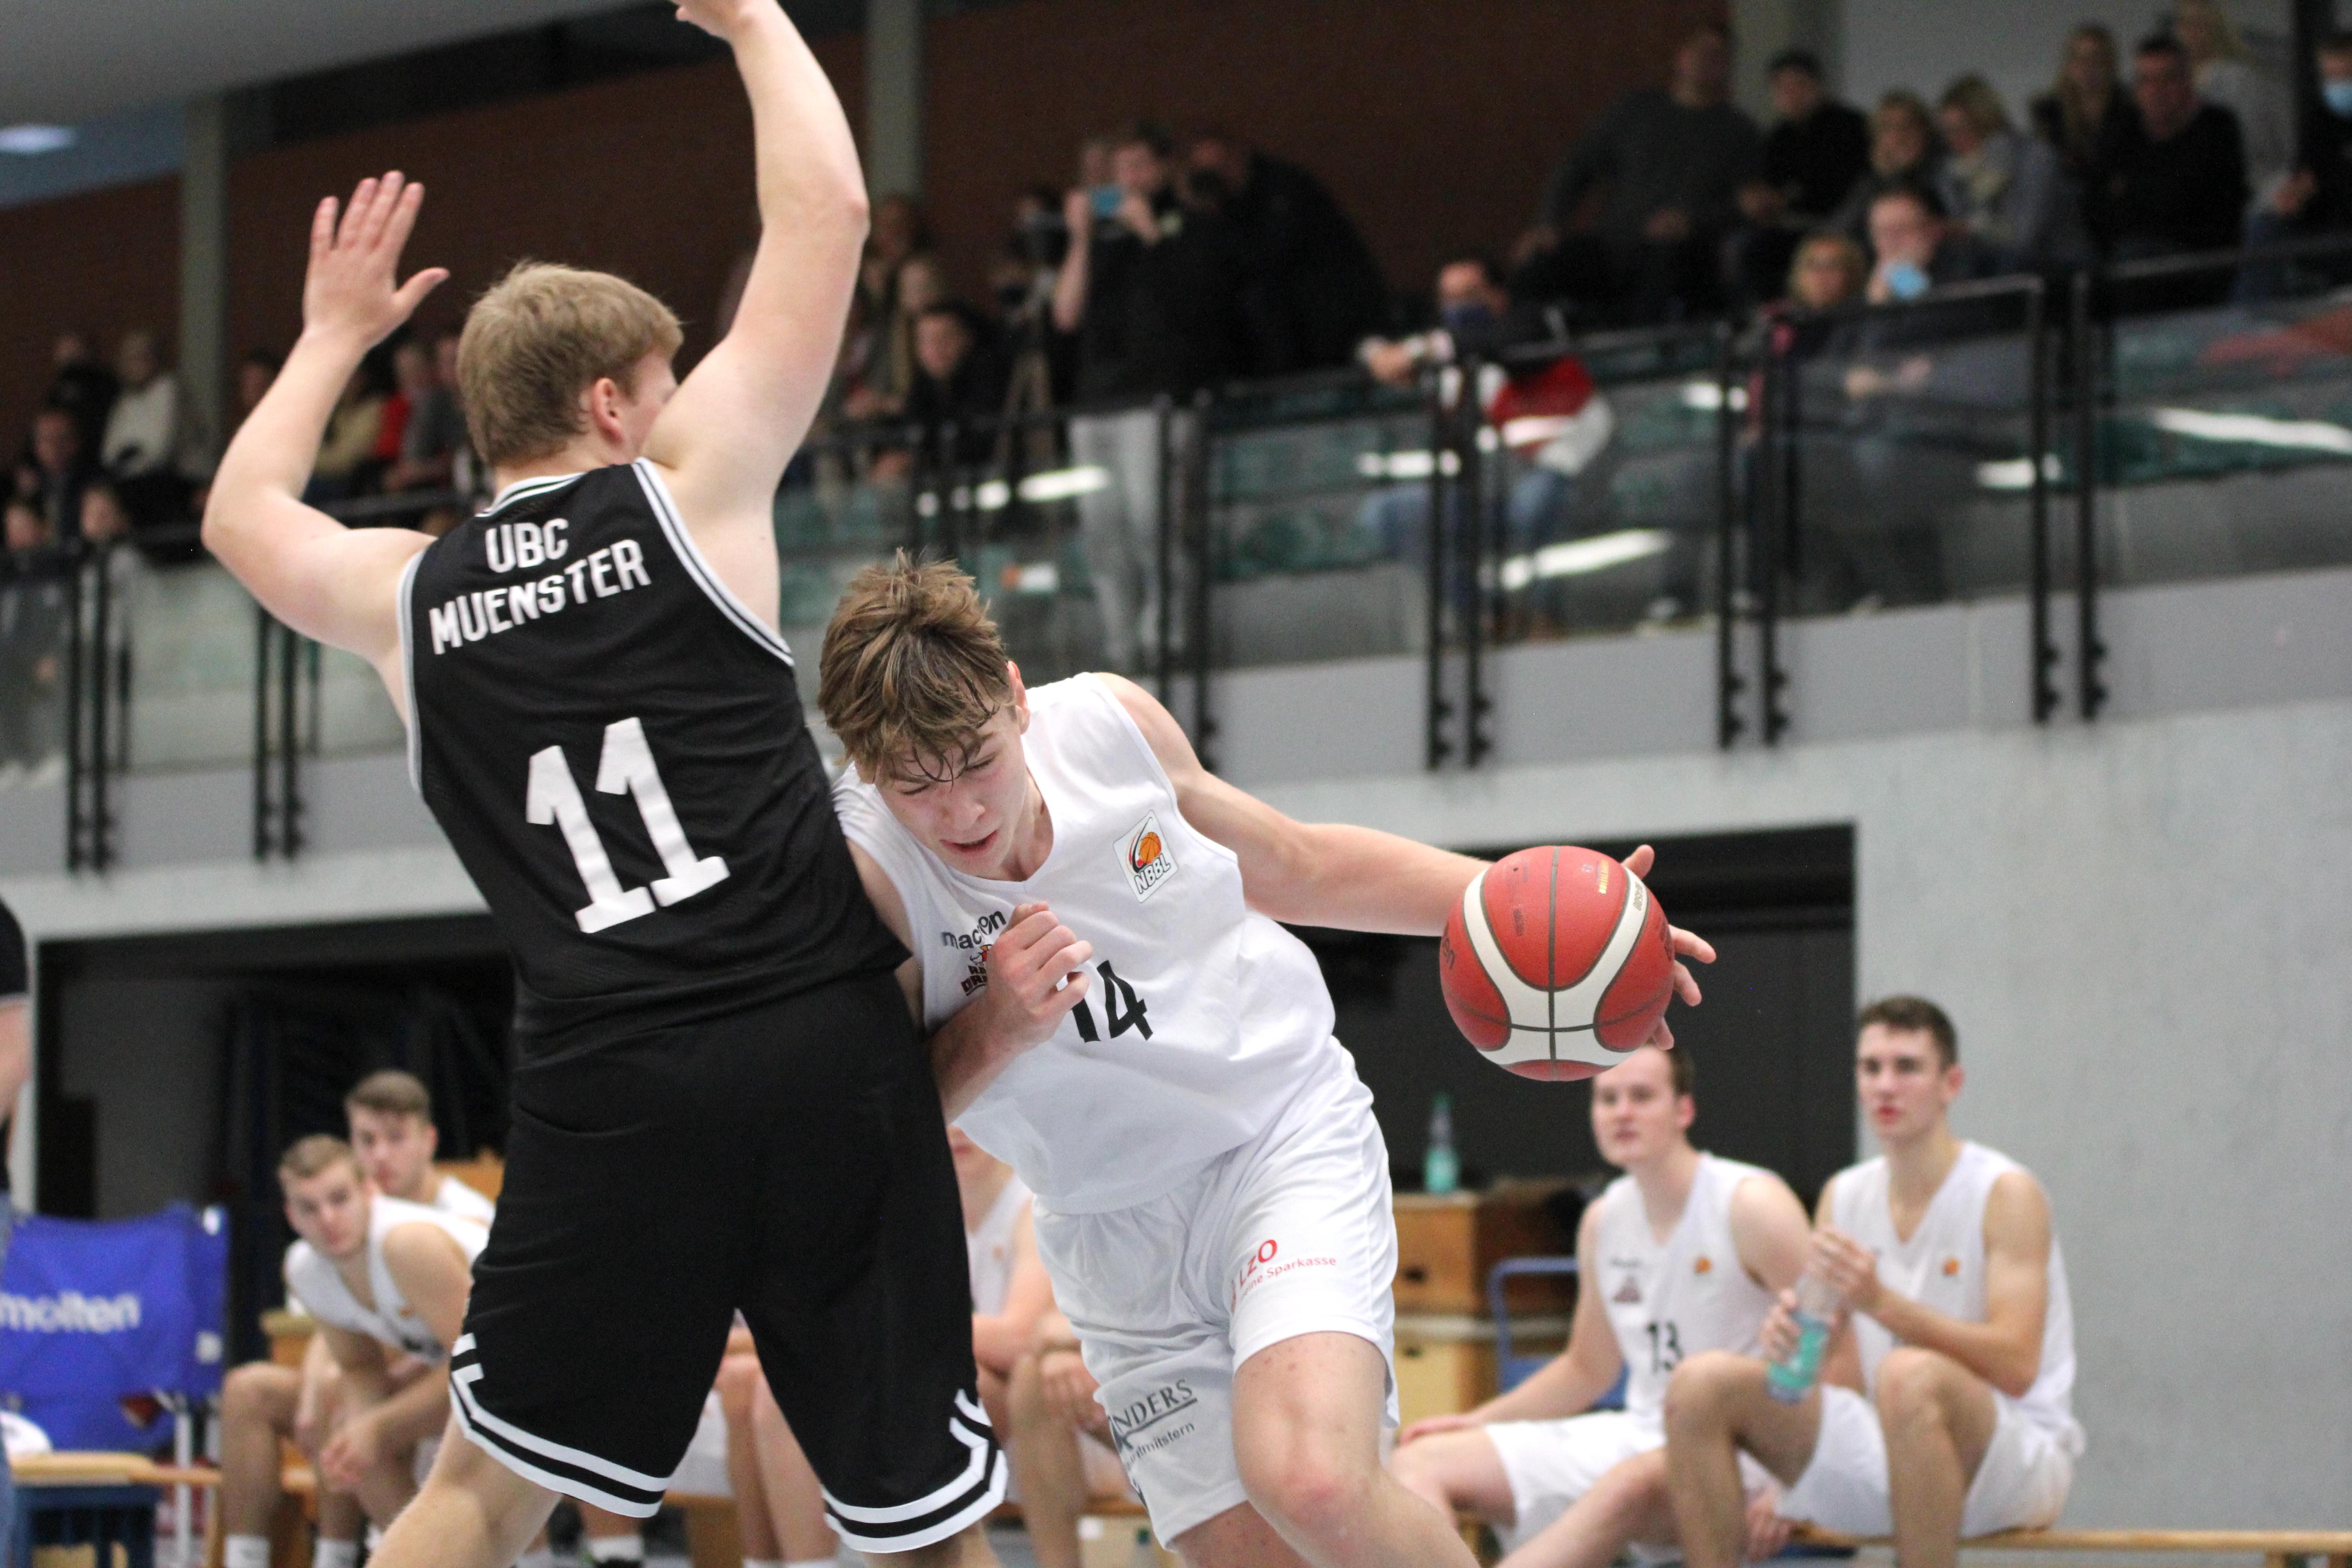 NBBL_20-21_YOUNG-RASTA-DRAGONS_Münster_Spieltag1_Kilian-Brockhoff_4